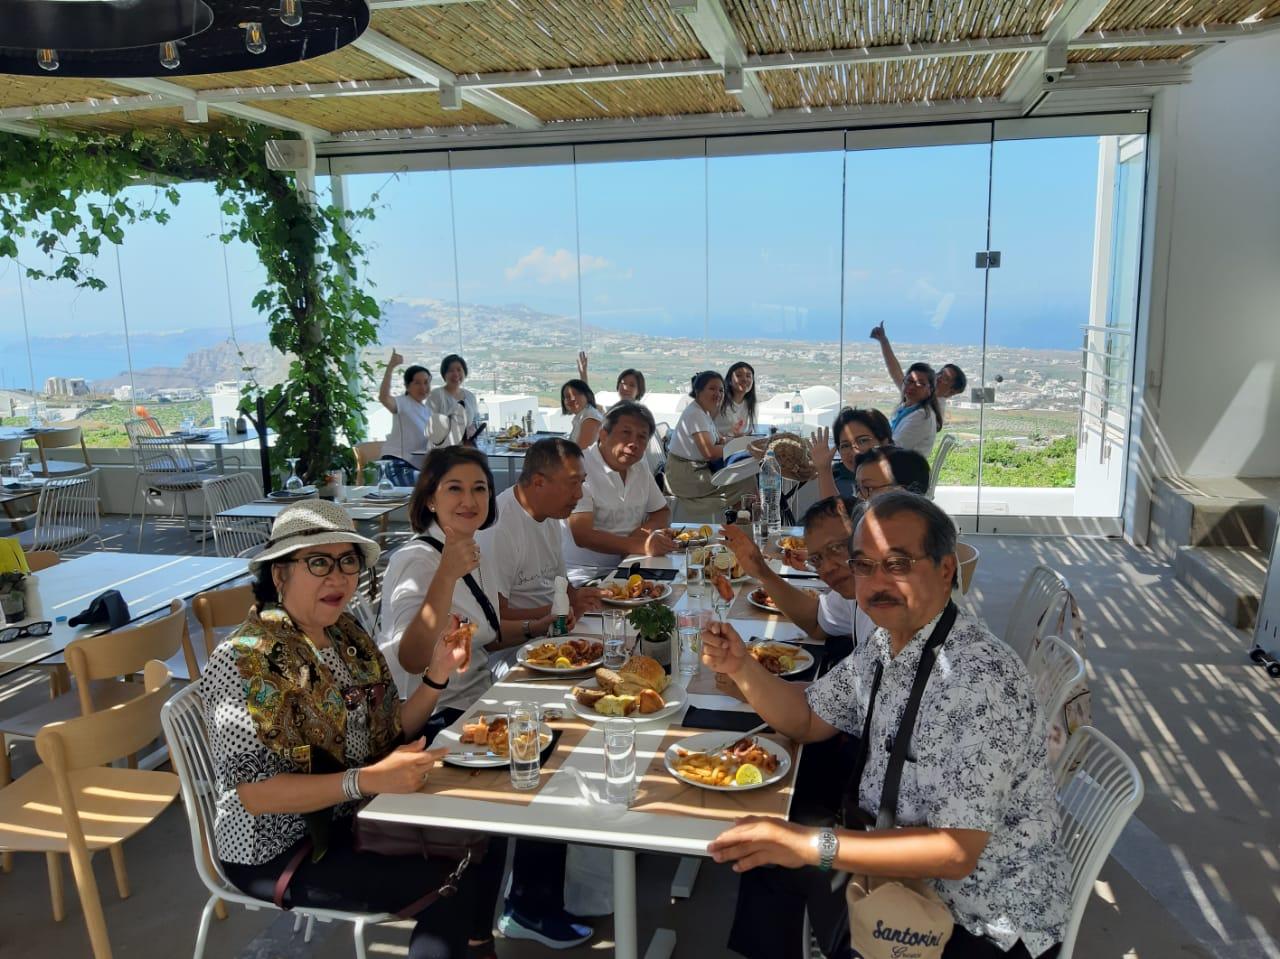 Italy Santorini 24 mei 2019 7